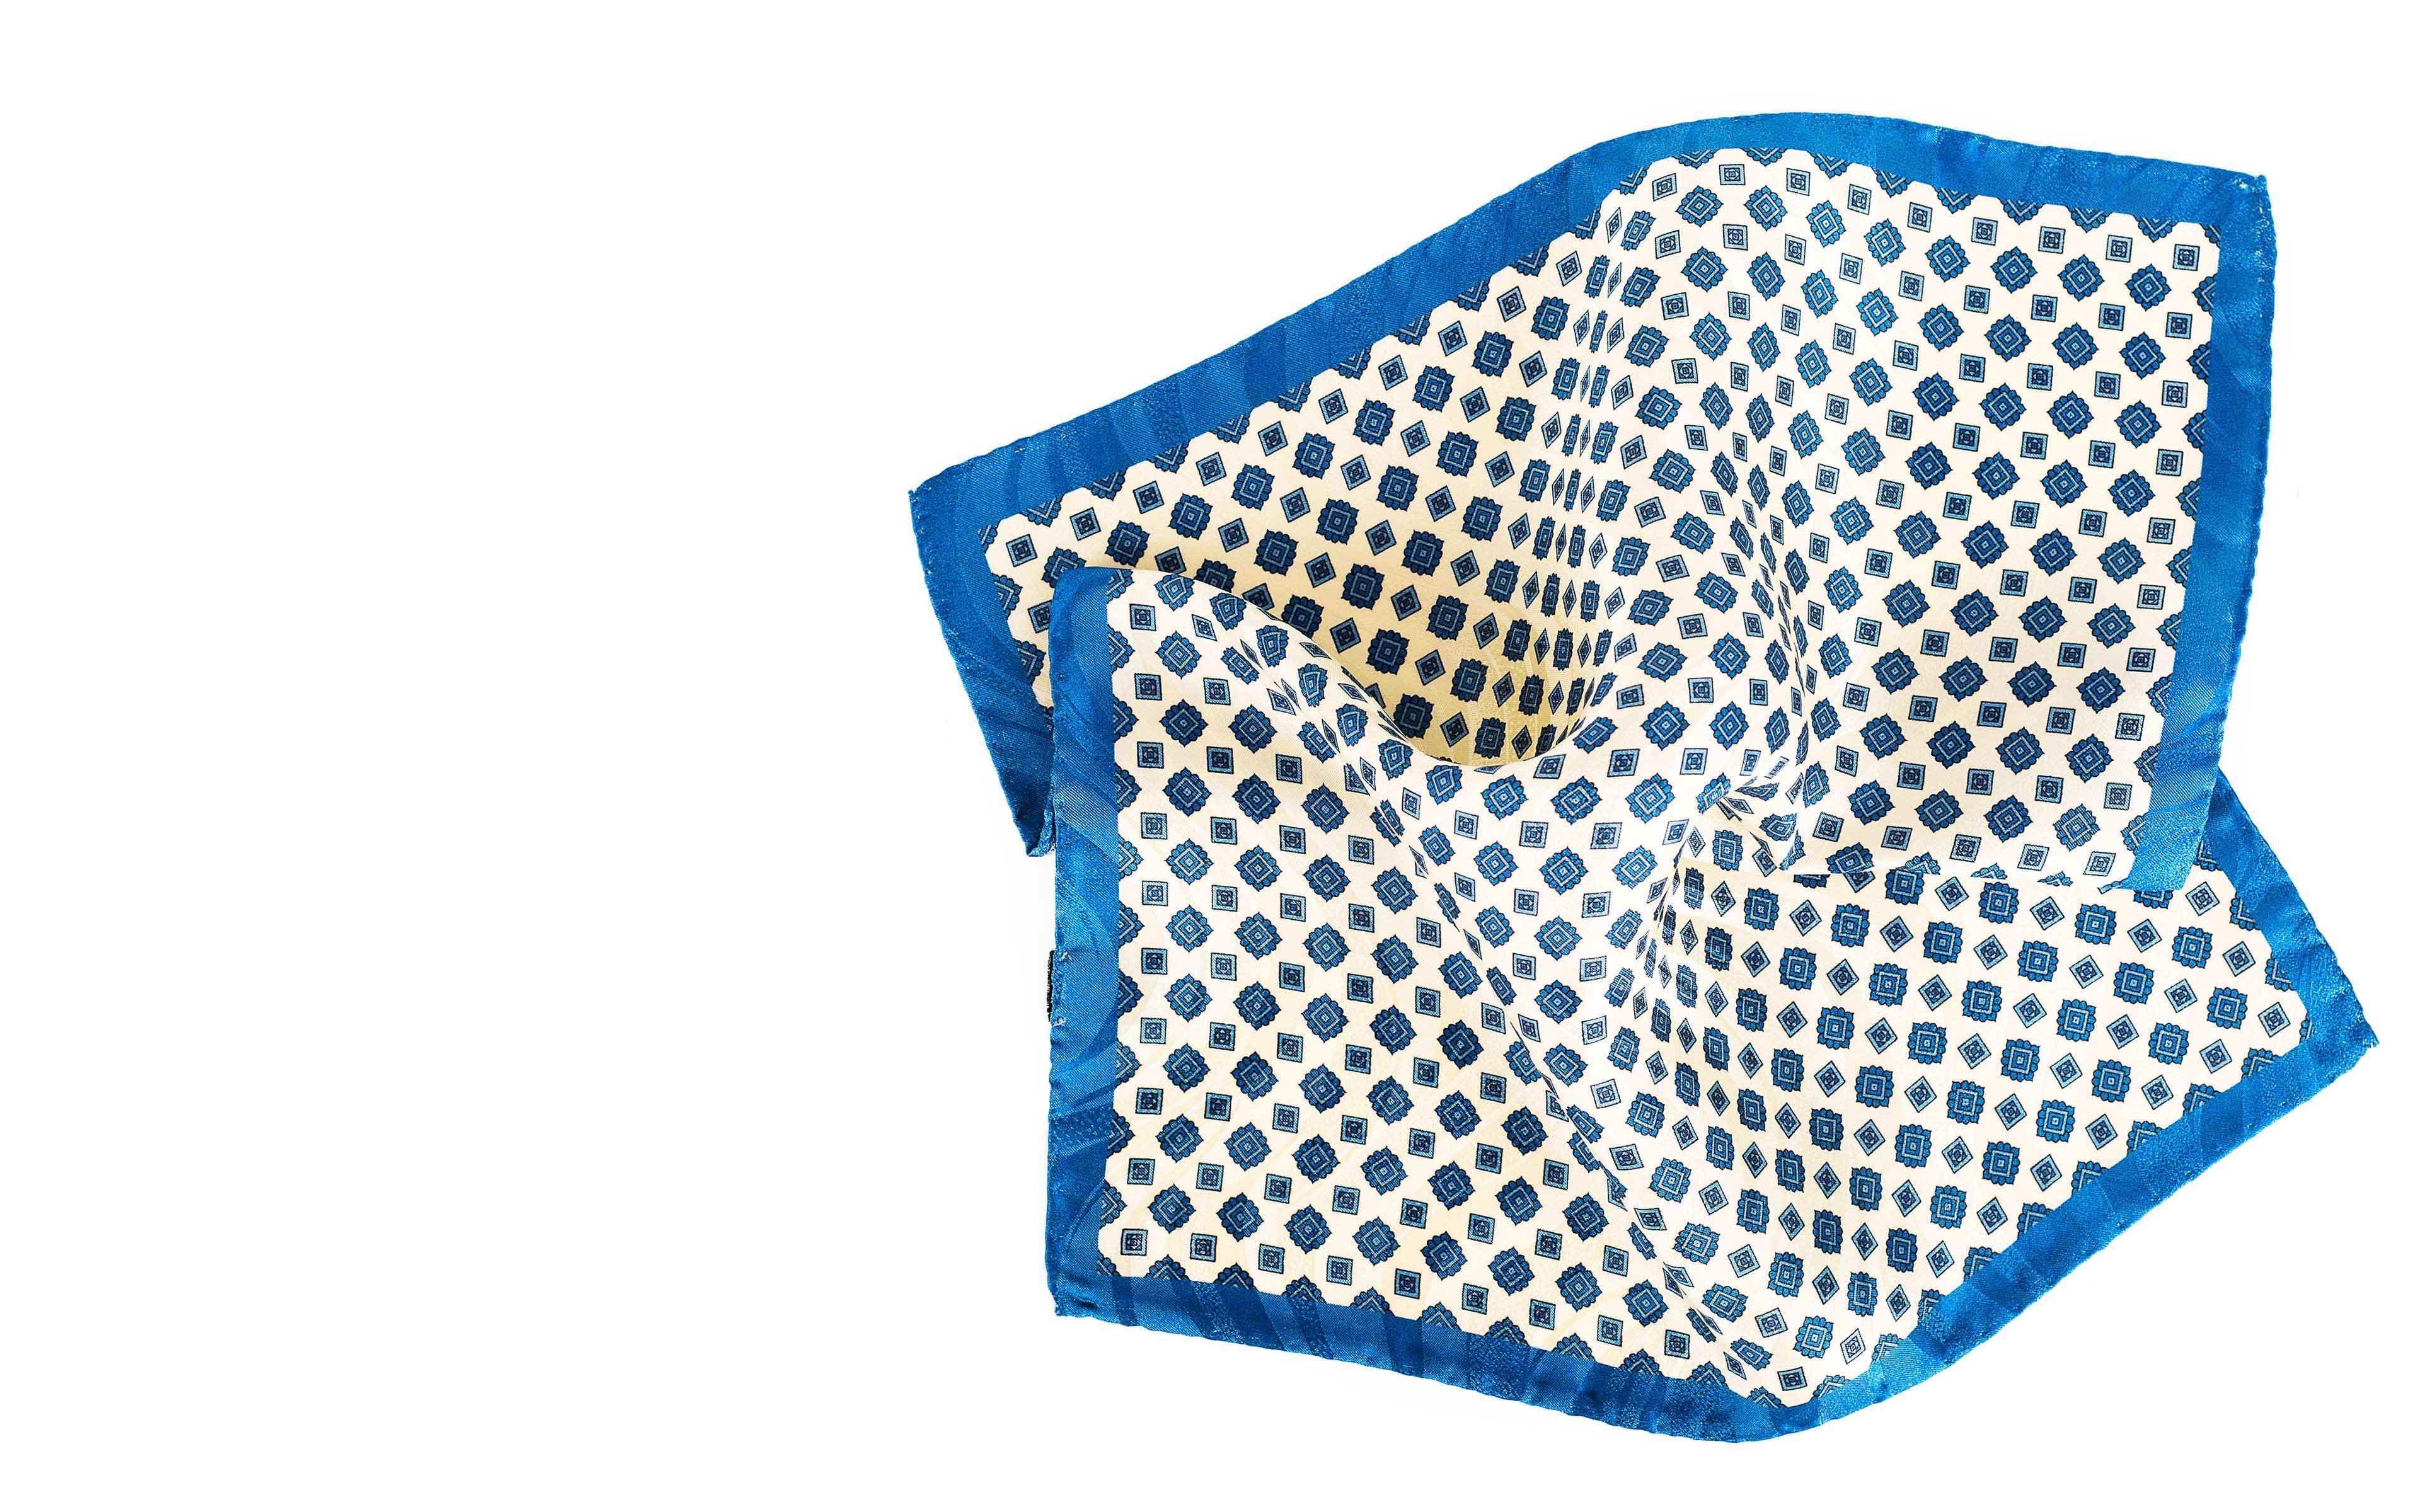 Ivory & Denim Blue Pocket Square